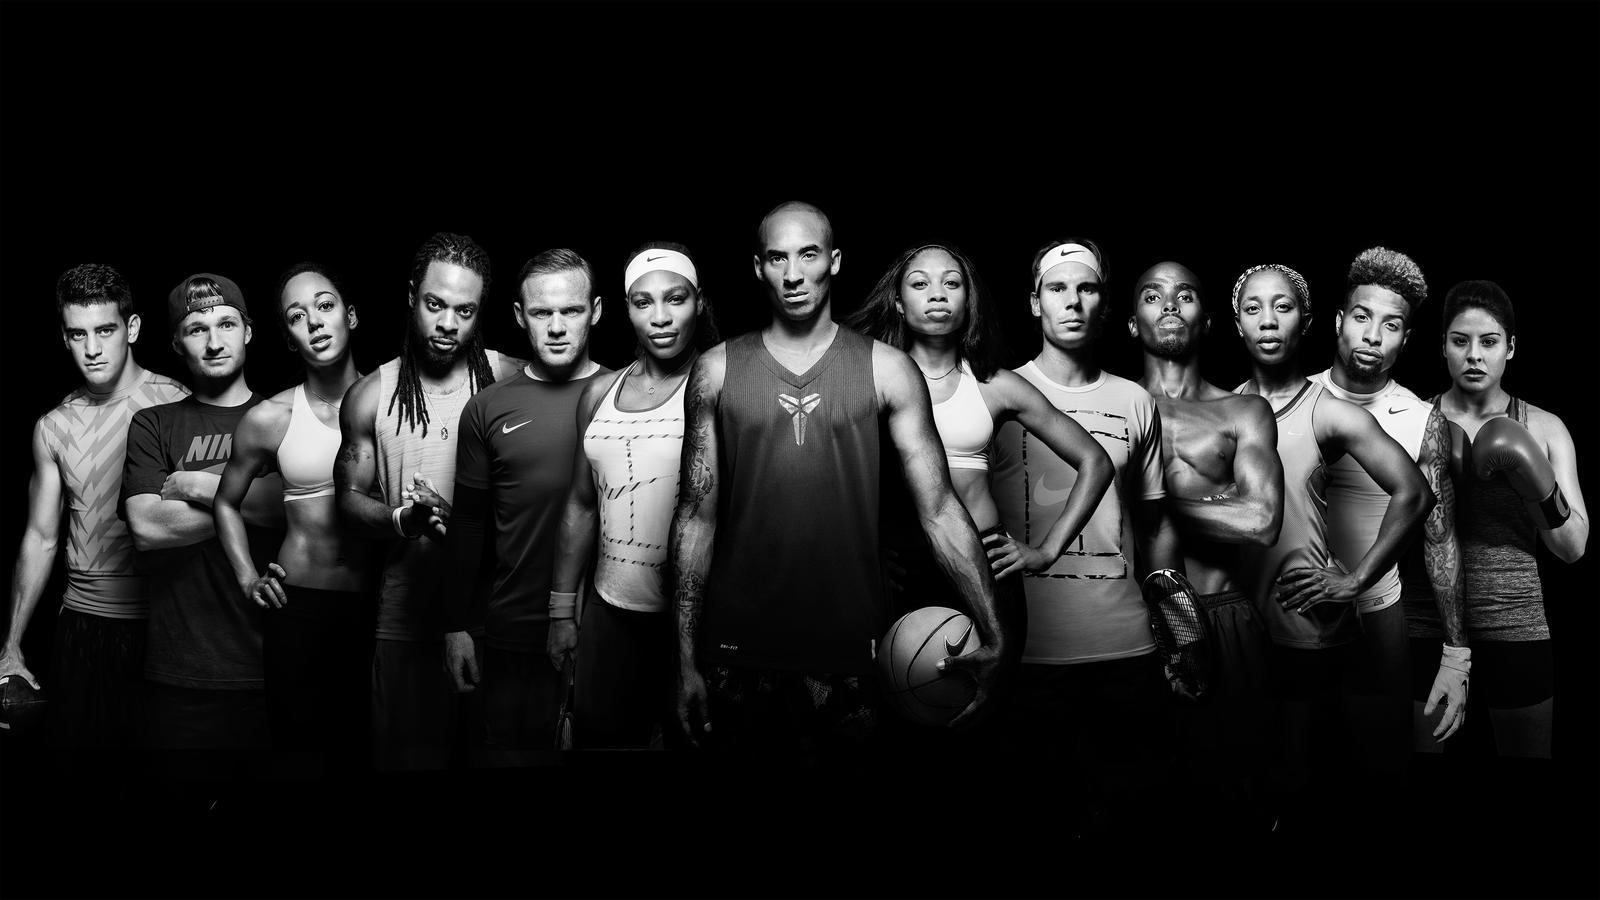 Nike 2015 Investor Day